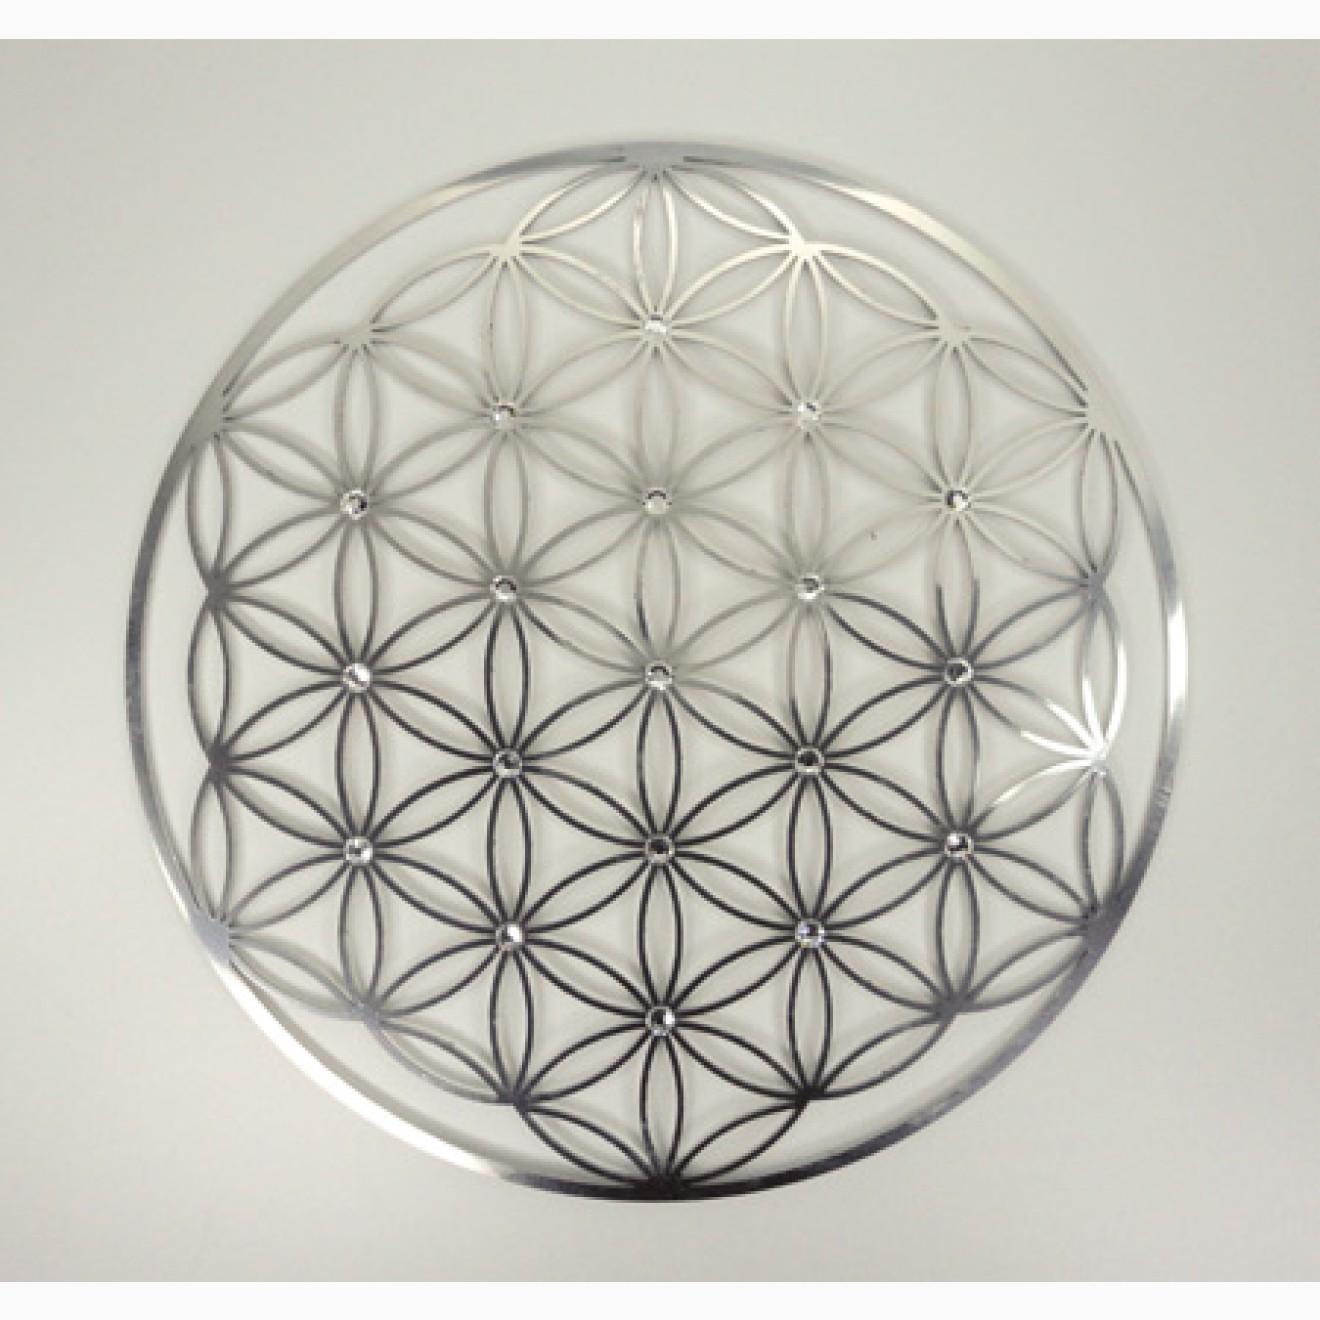 wandschmuck lebensblume edelstahl mit swarovski kristallen. Black Bedroom Furniture Sets. Home Design Ideas